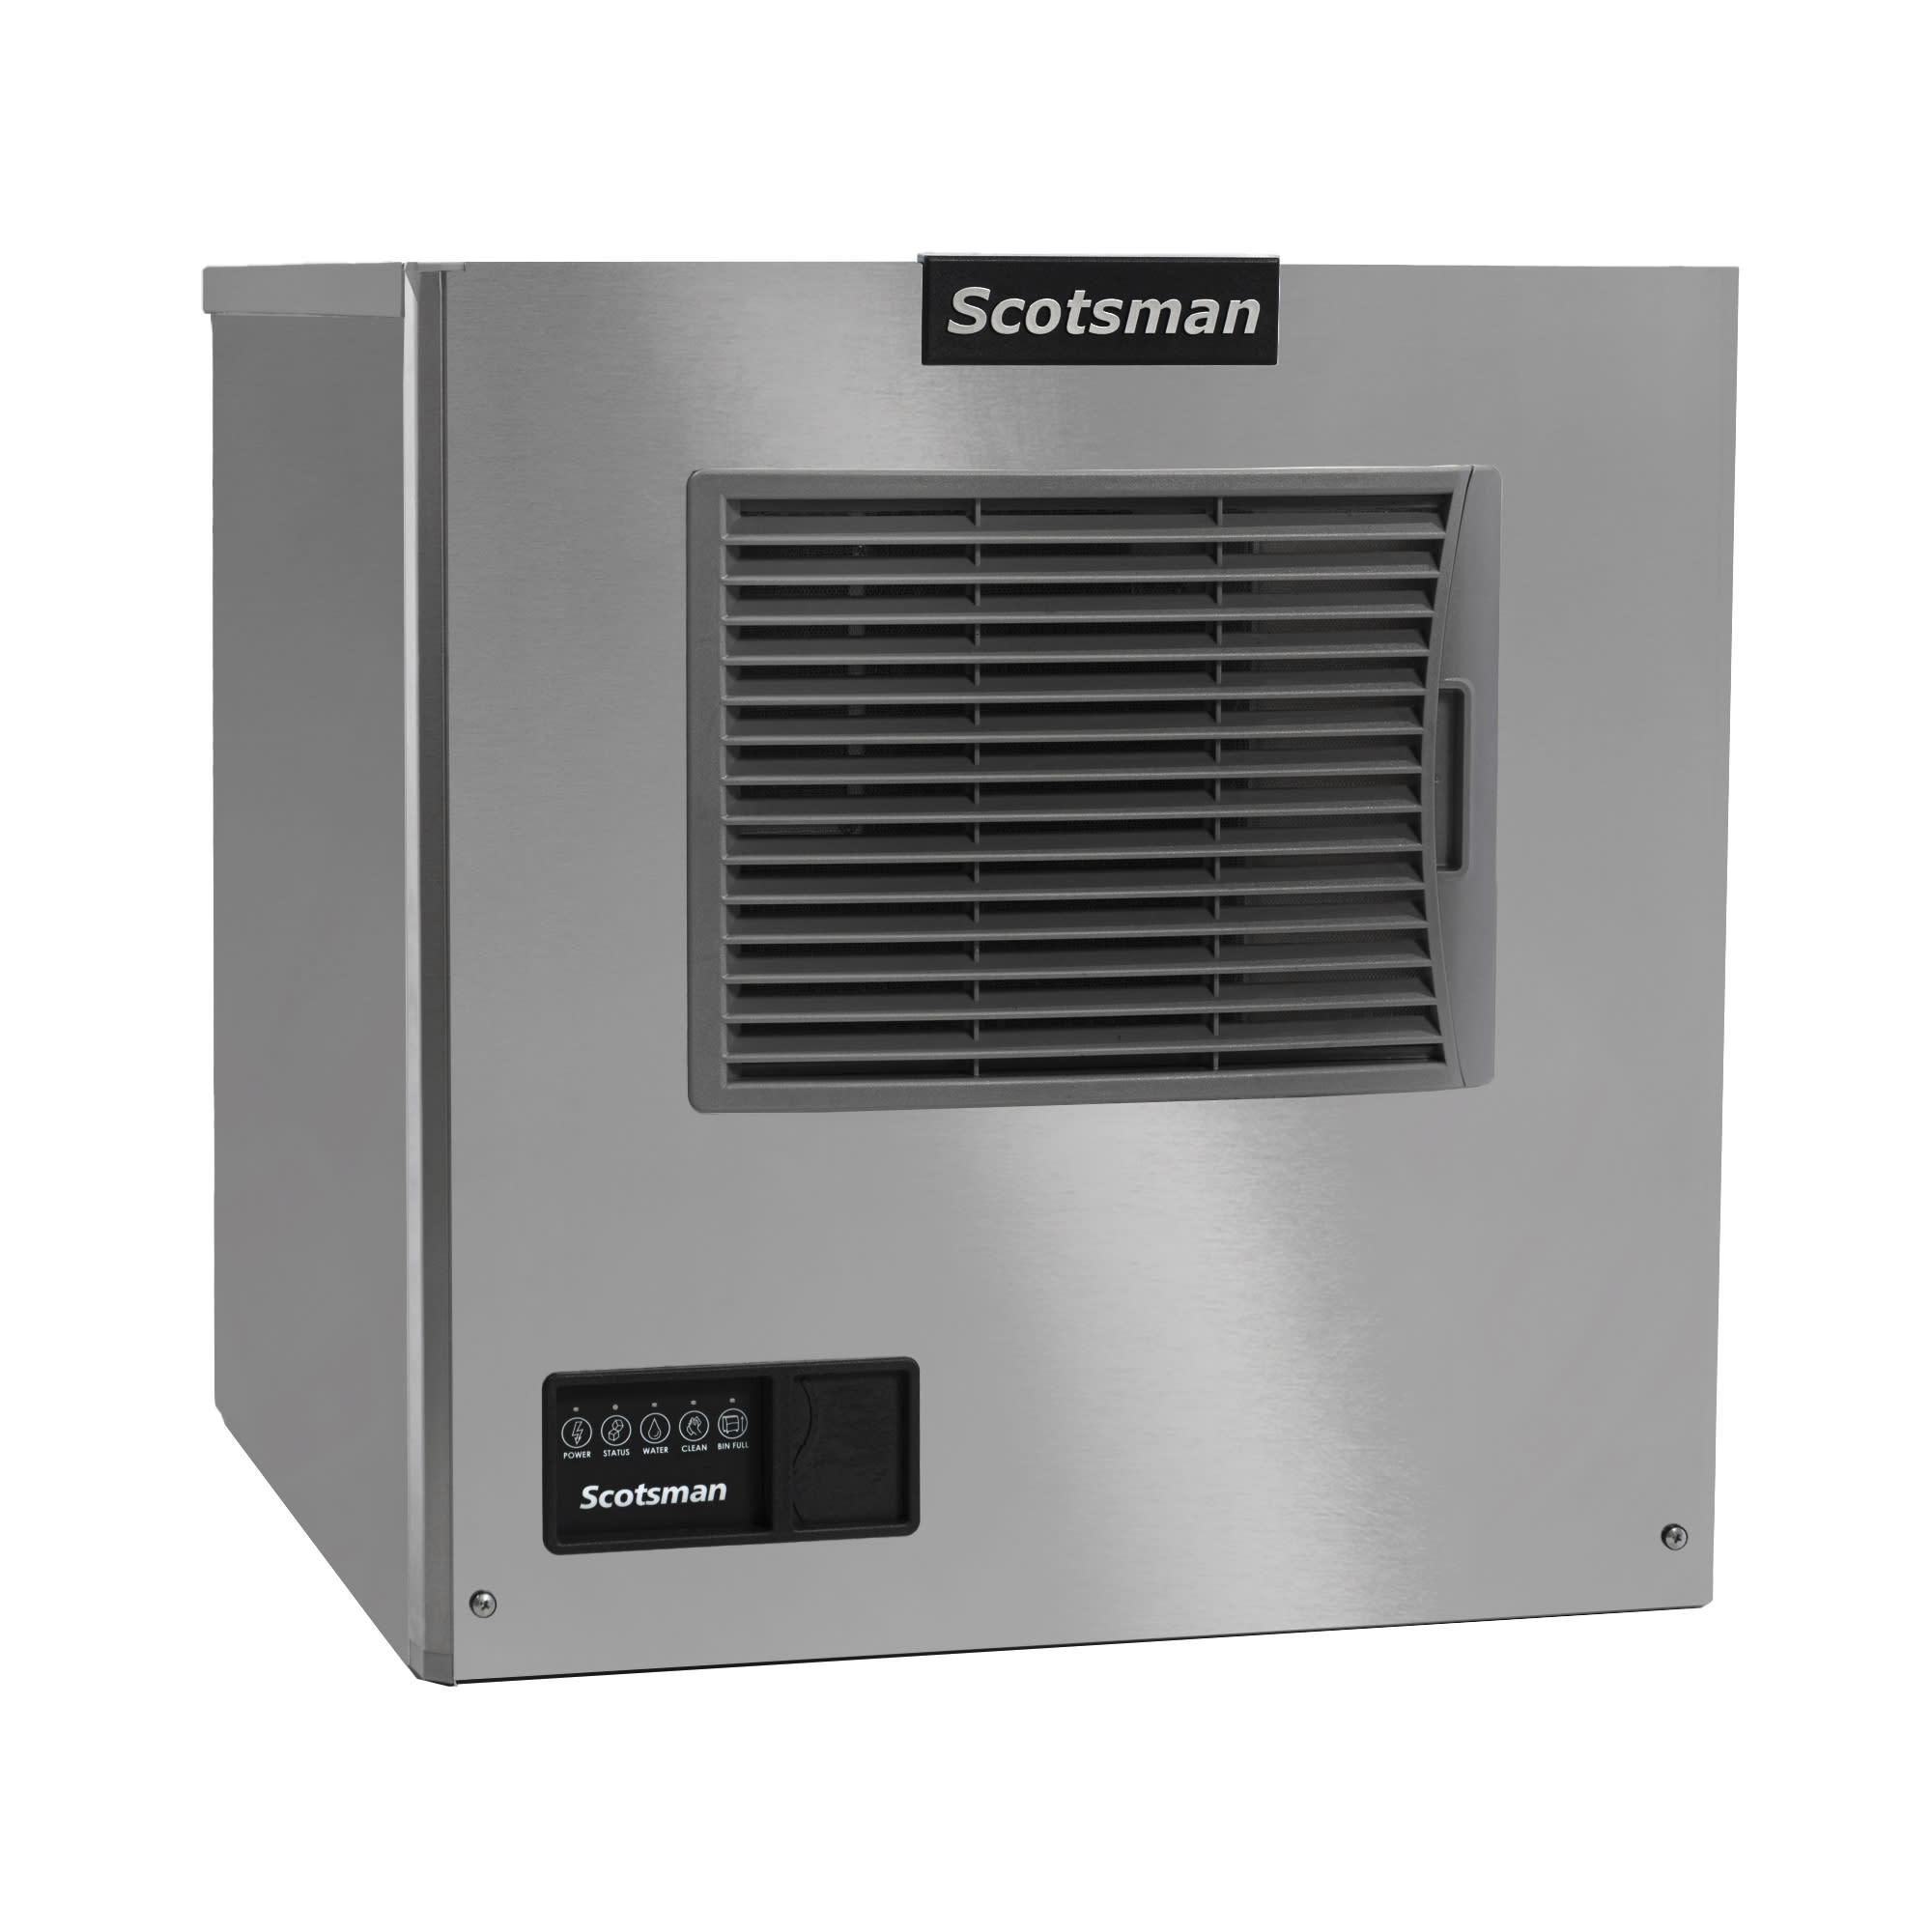 "Scotsman C0322MA-1 22"" Prodigy Plus® Full Cube Ice Machine Head - 356 lb/day, Air Cooled, 115v"